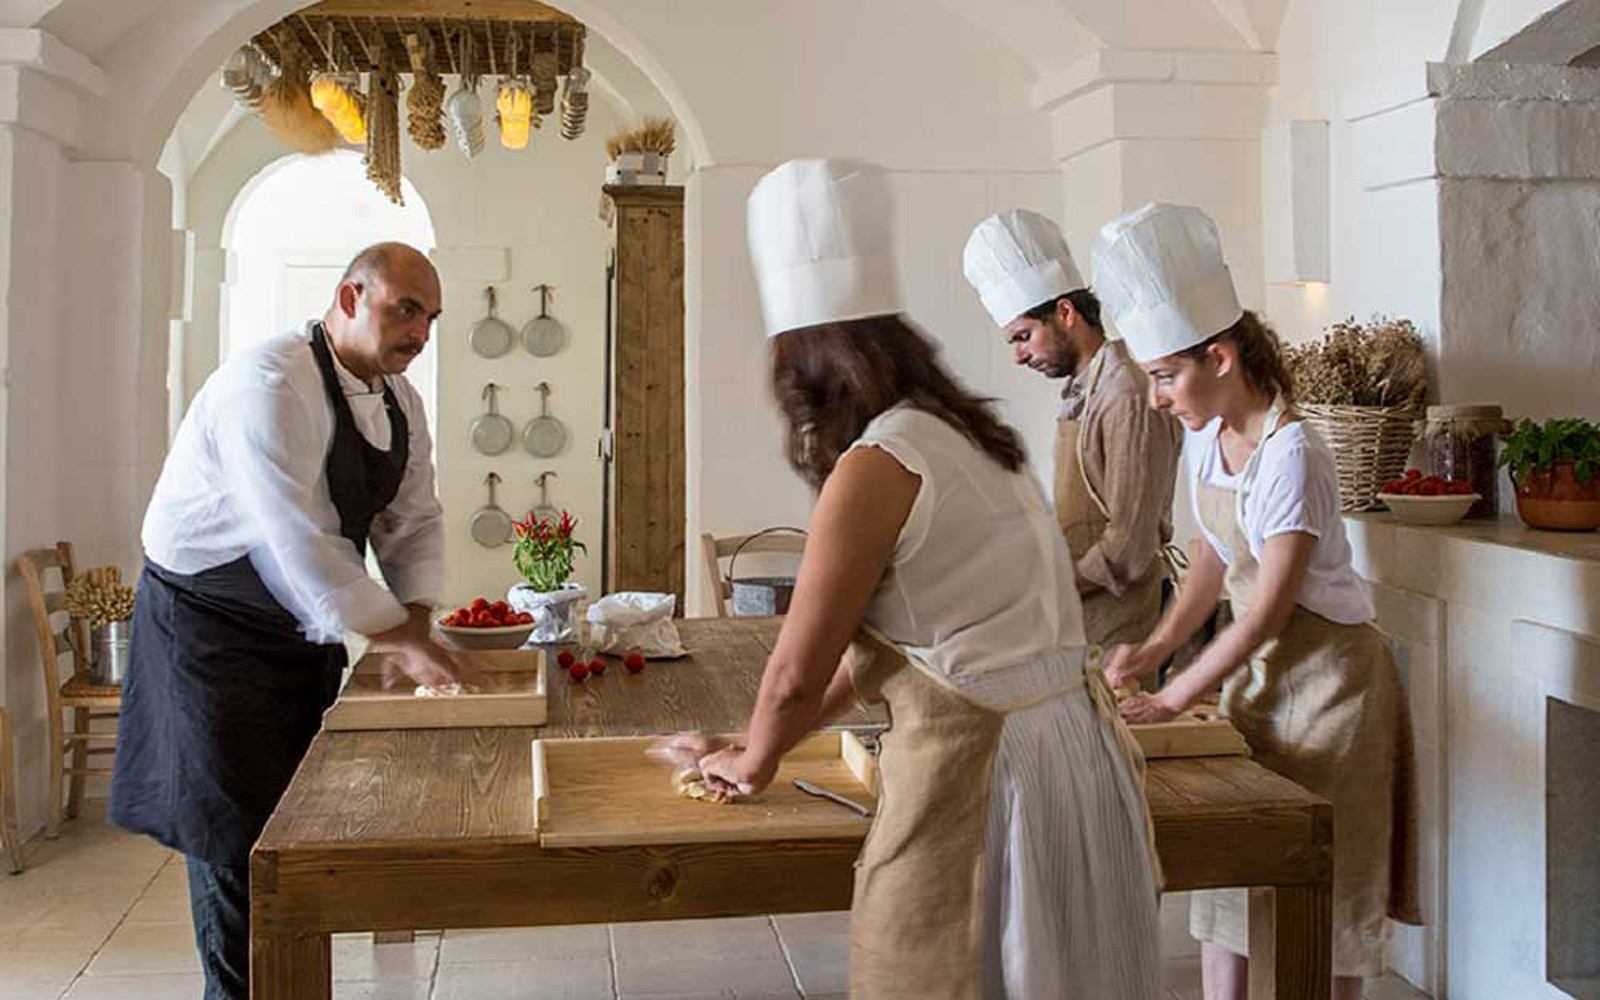 Activities - Making Fresh Pasta at the Borgo Egnazia